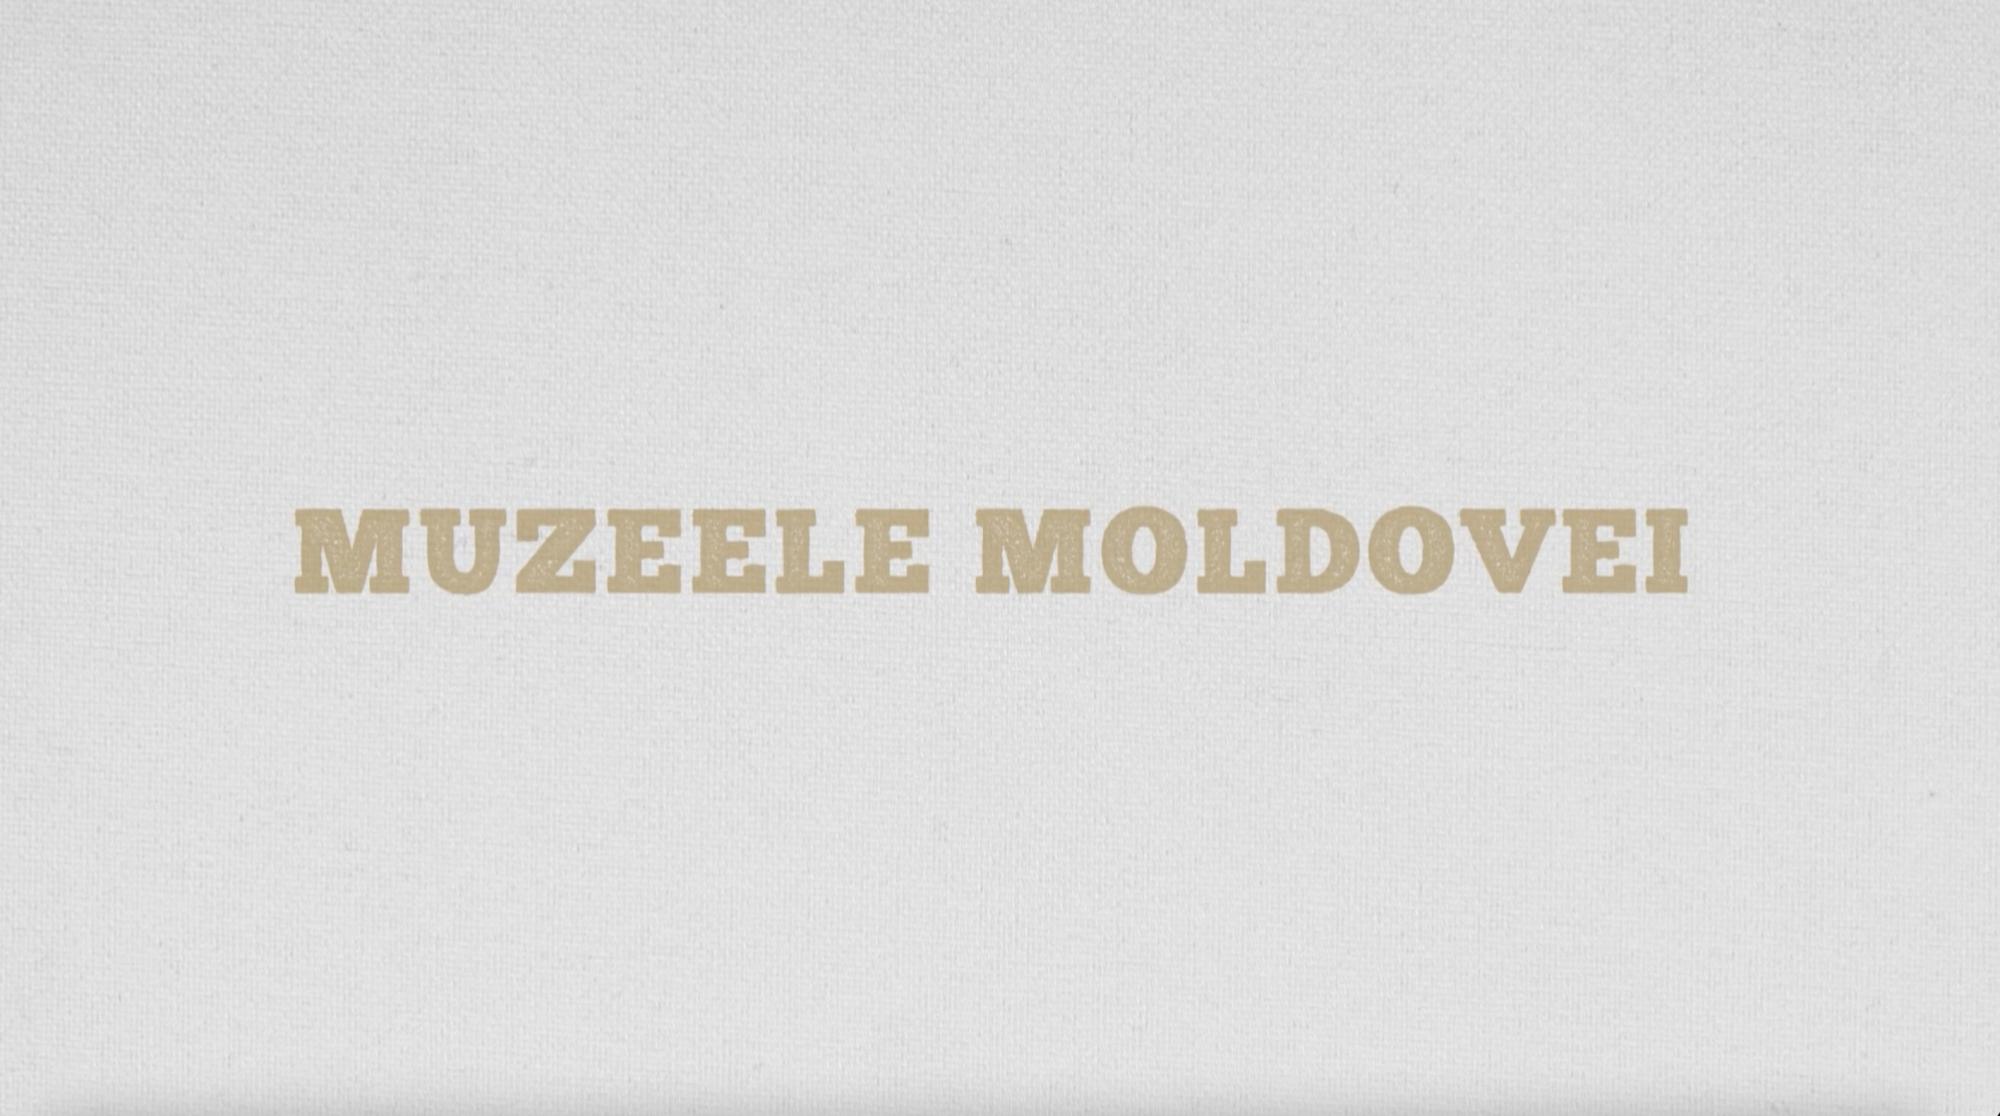 Muzeele Moldovei